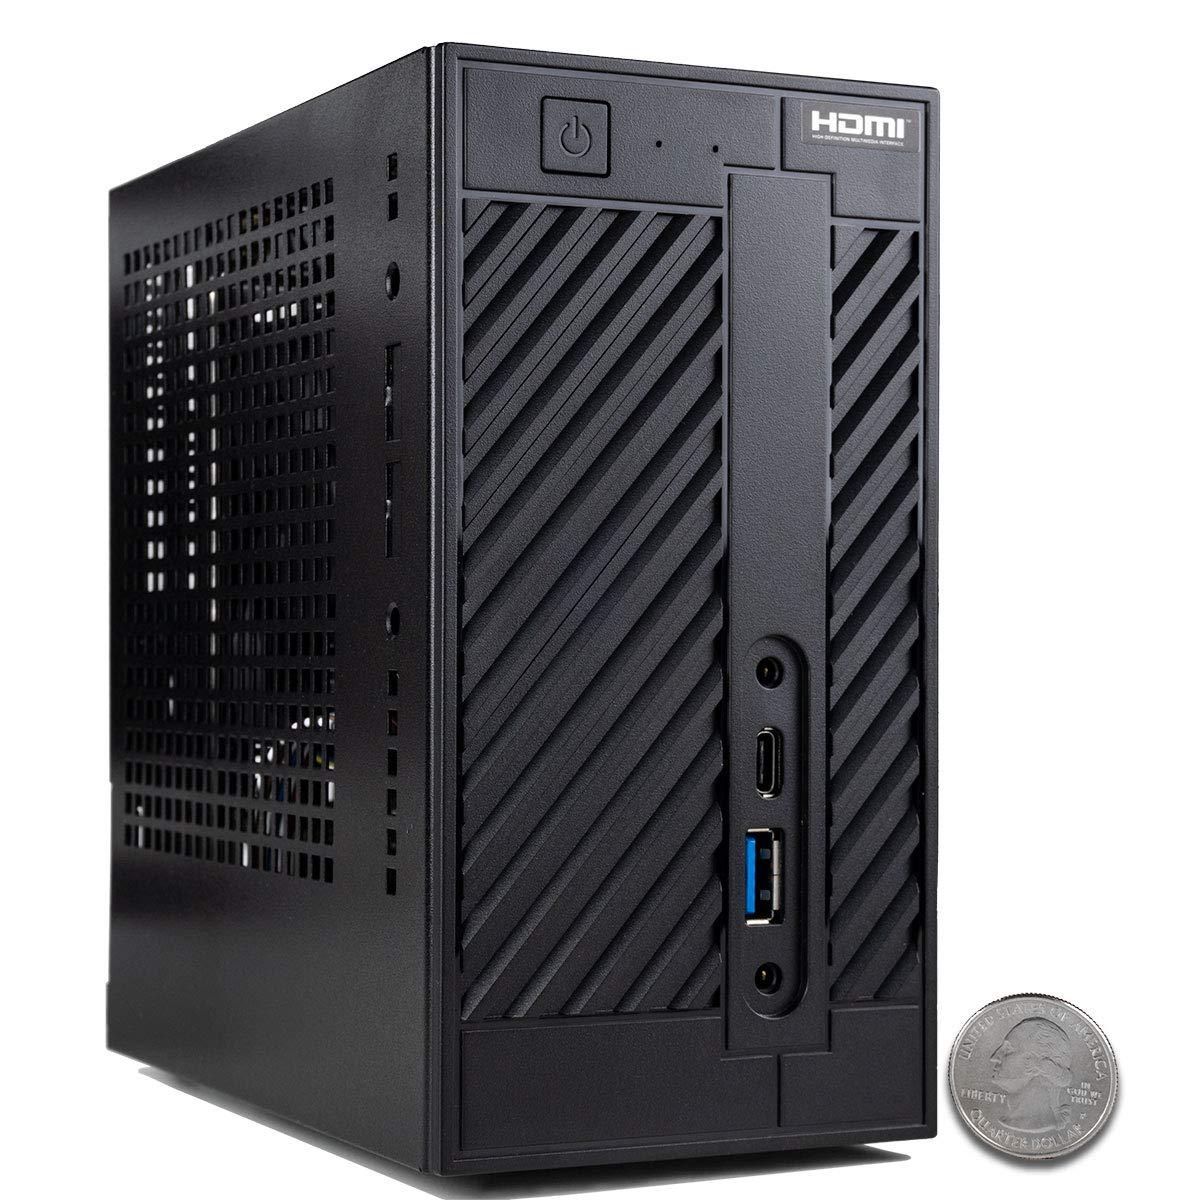 CUK AsRock DeskMini A300W Tiny Desktop (AMD Ryzen 3 3200G + Radeon RX Vega 8, 16GB 2666MHz DDR4 RAM, 512GB NVMe SSD, No OS) Mini Small Form Factor PC Computer